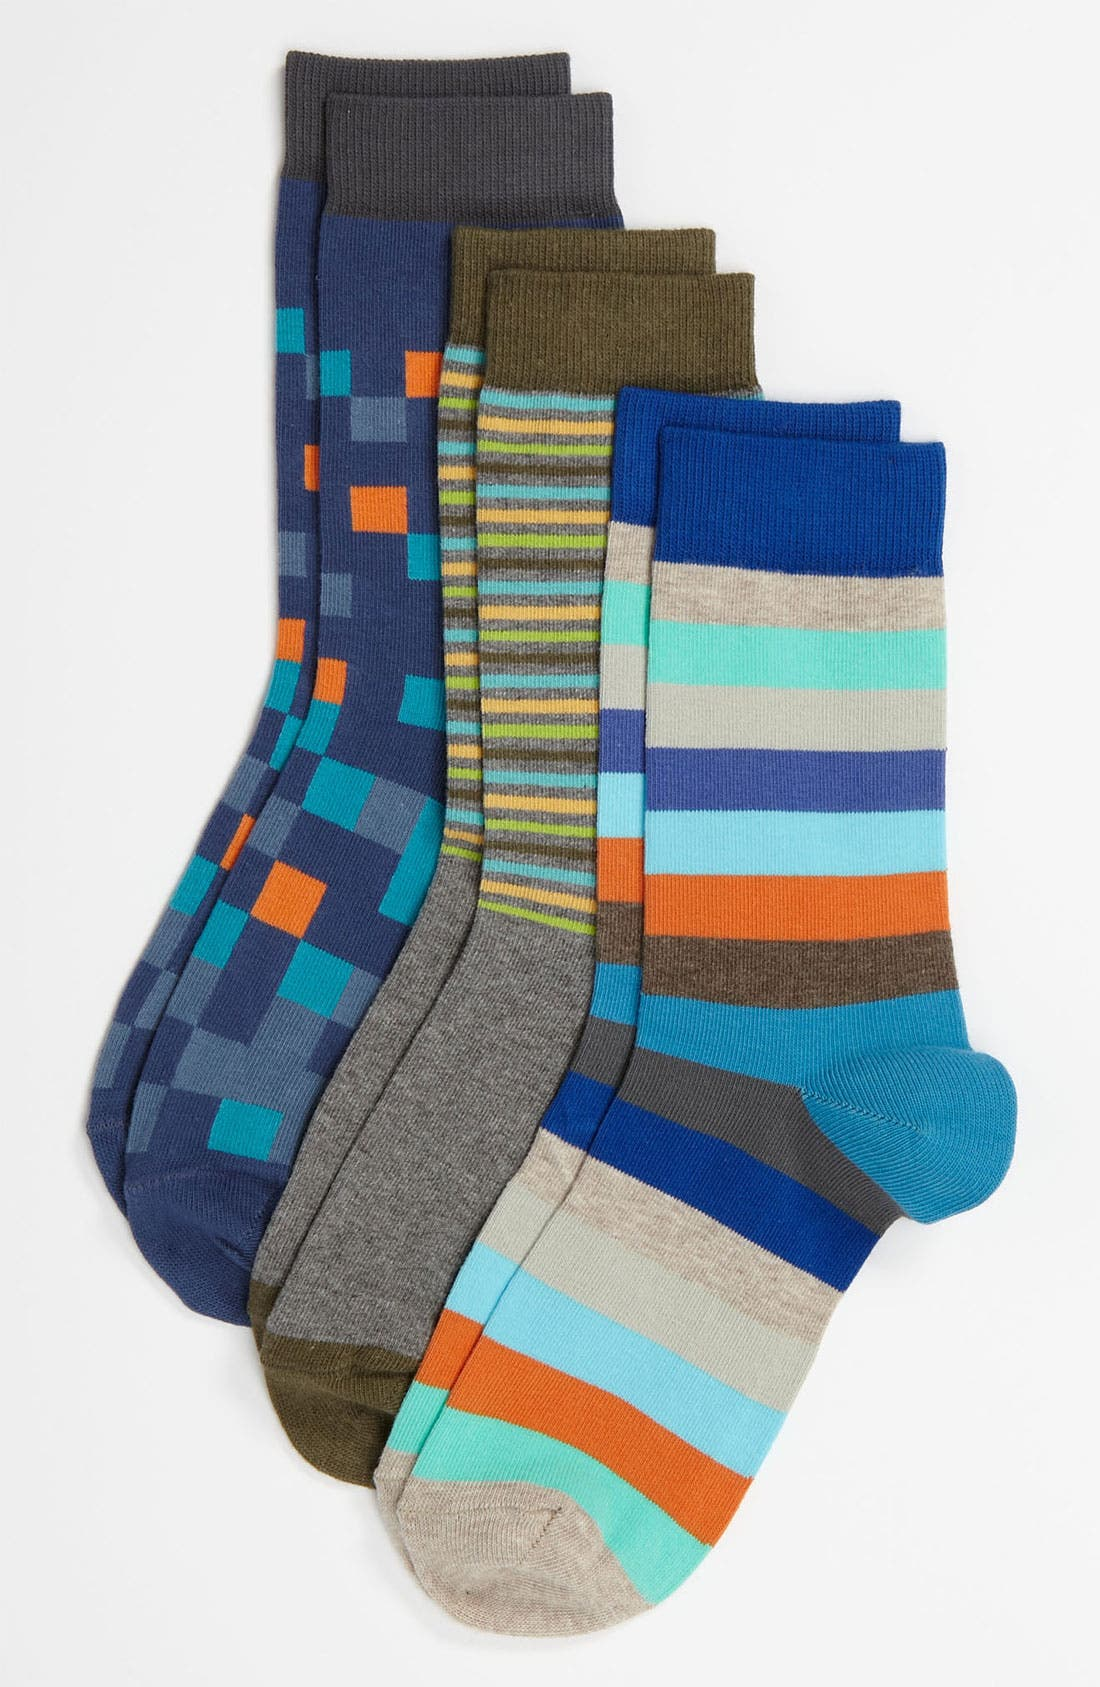 Main Image - Nordstrom 'Pixel Mix' Crew Socks (3-Pack) (Kids)